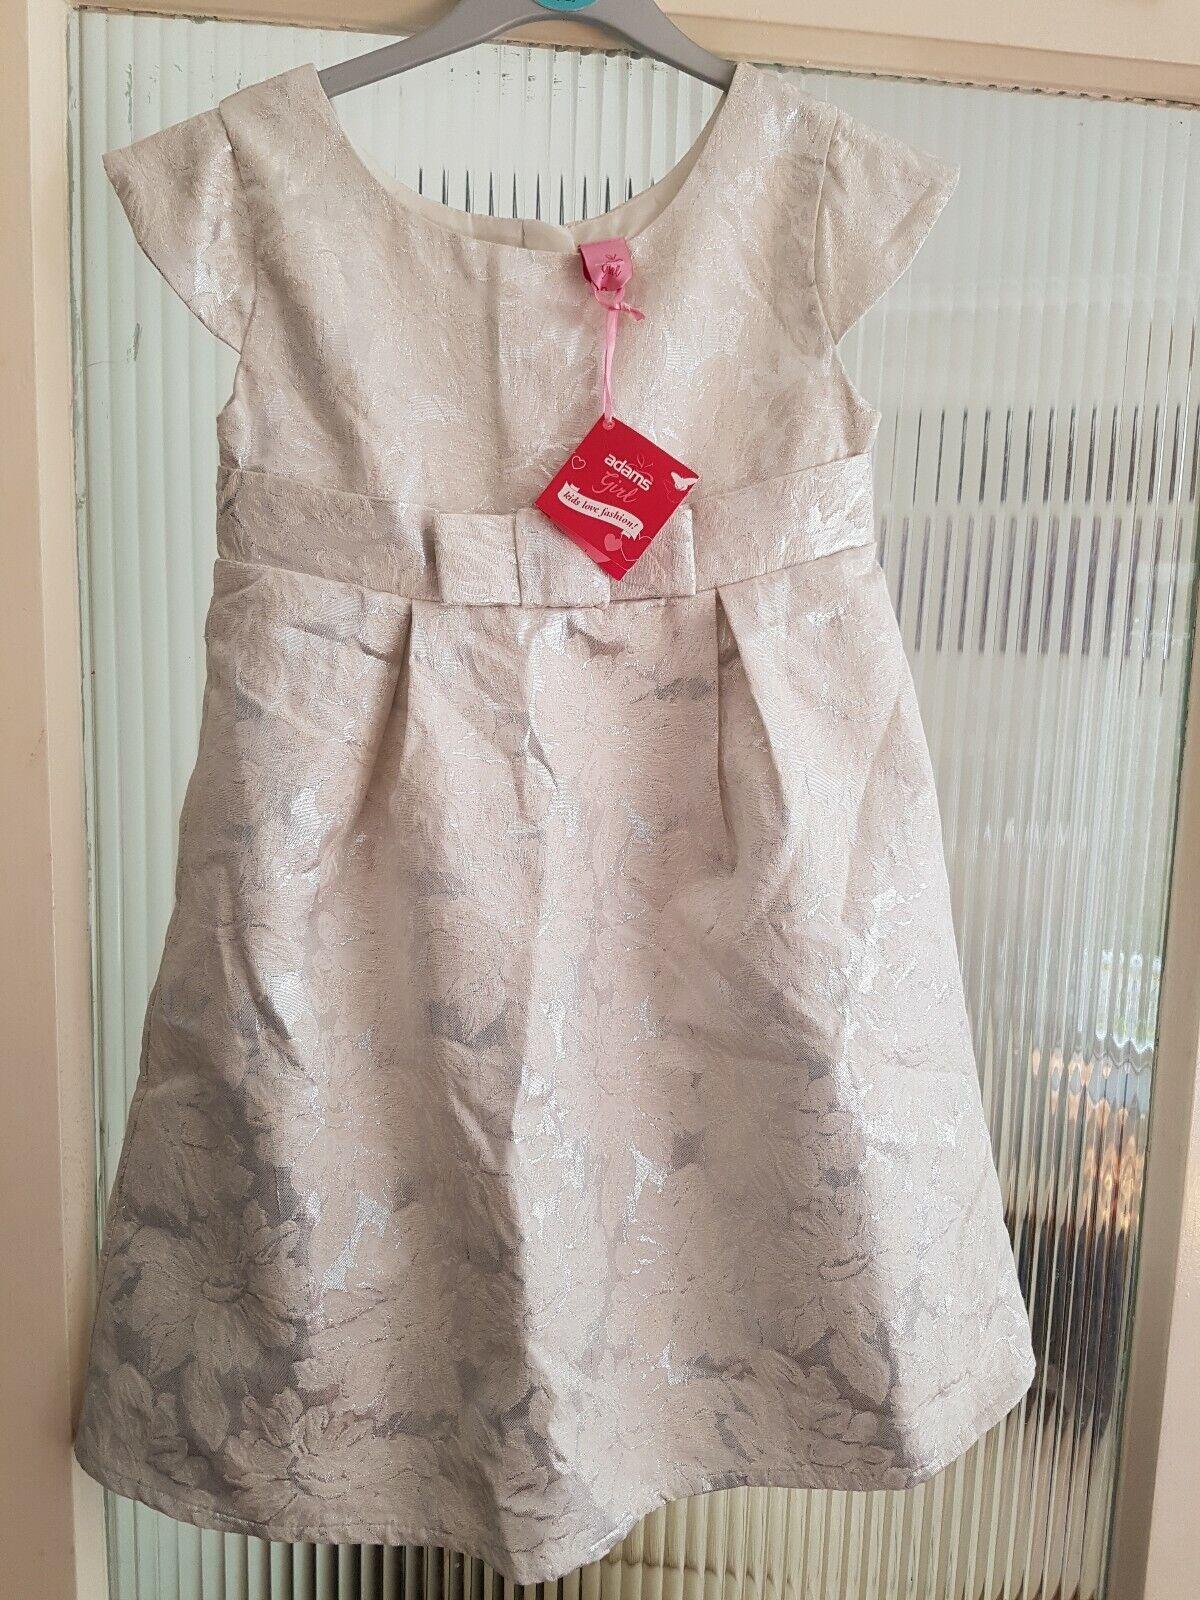 9 Years Ivory Silver Bridesmaid Smart Party Dress Adams BNWT